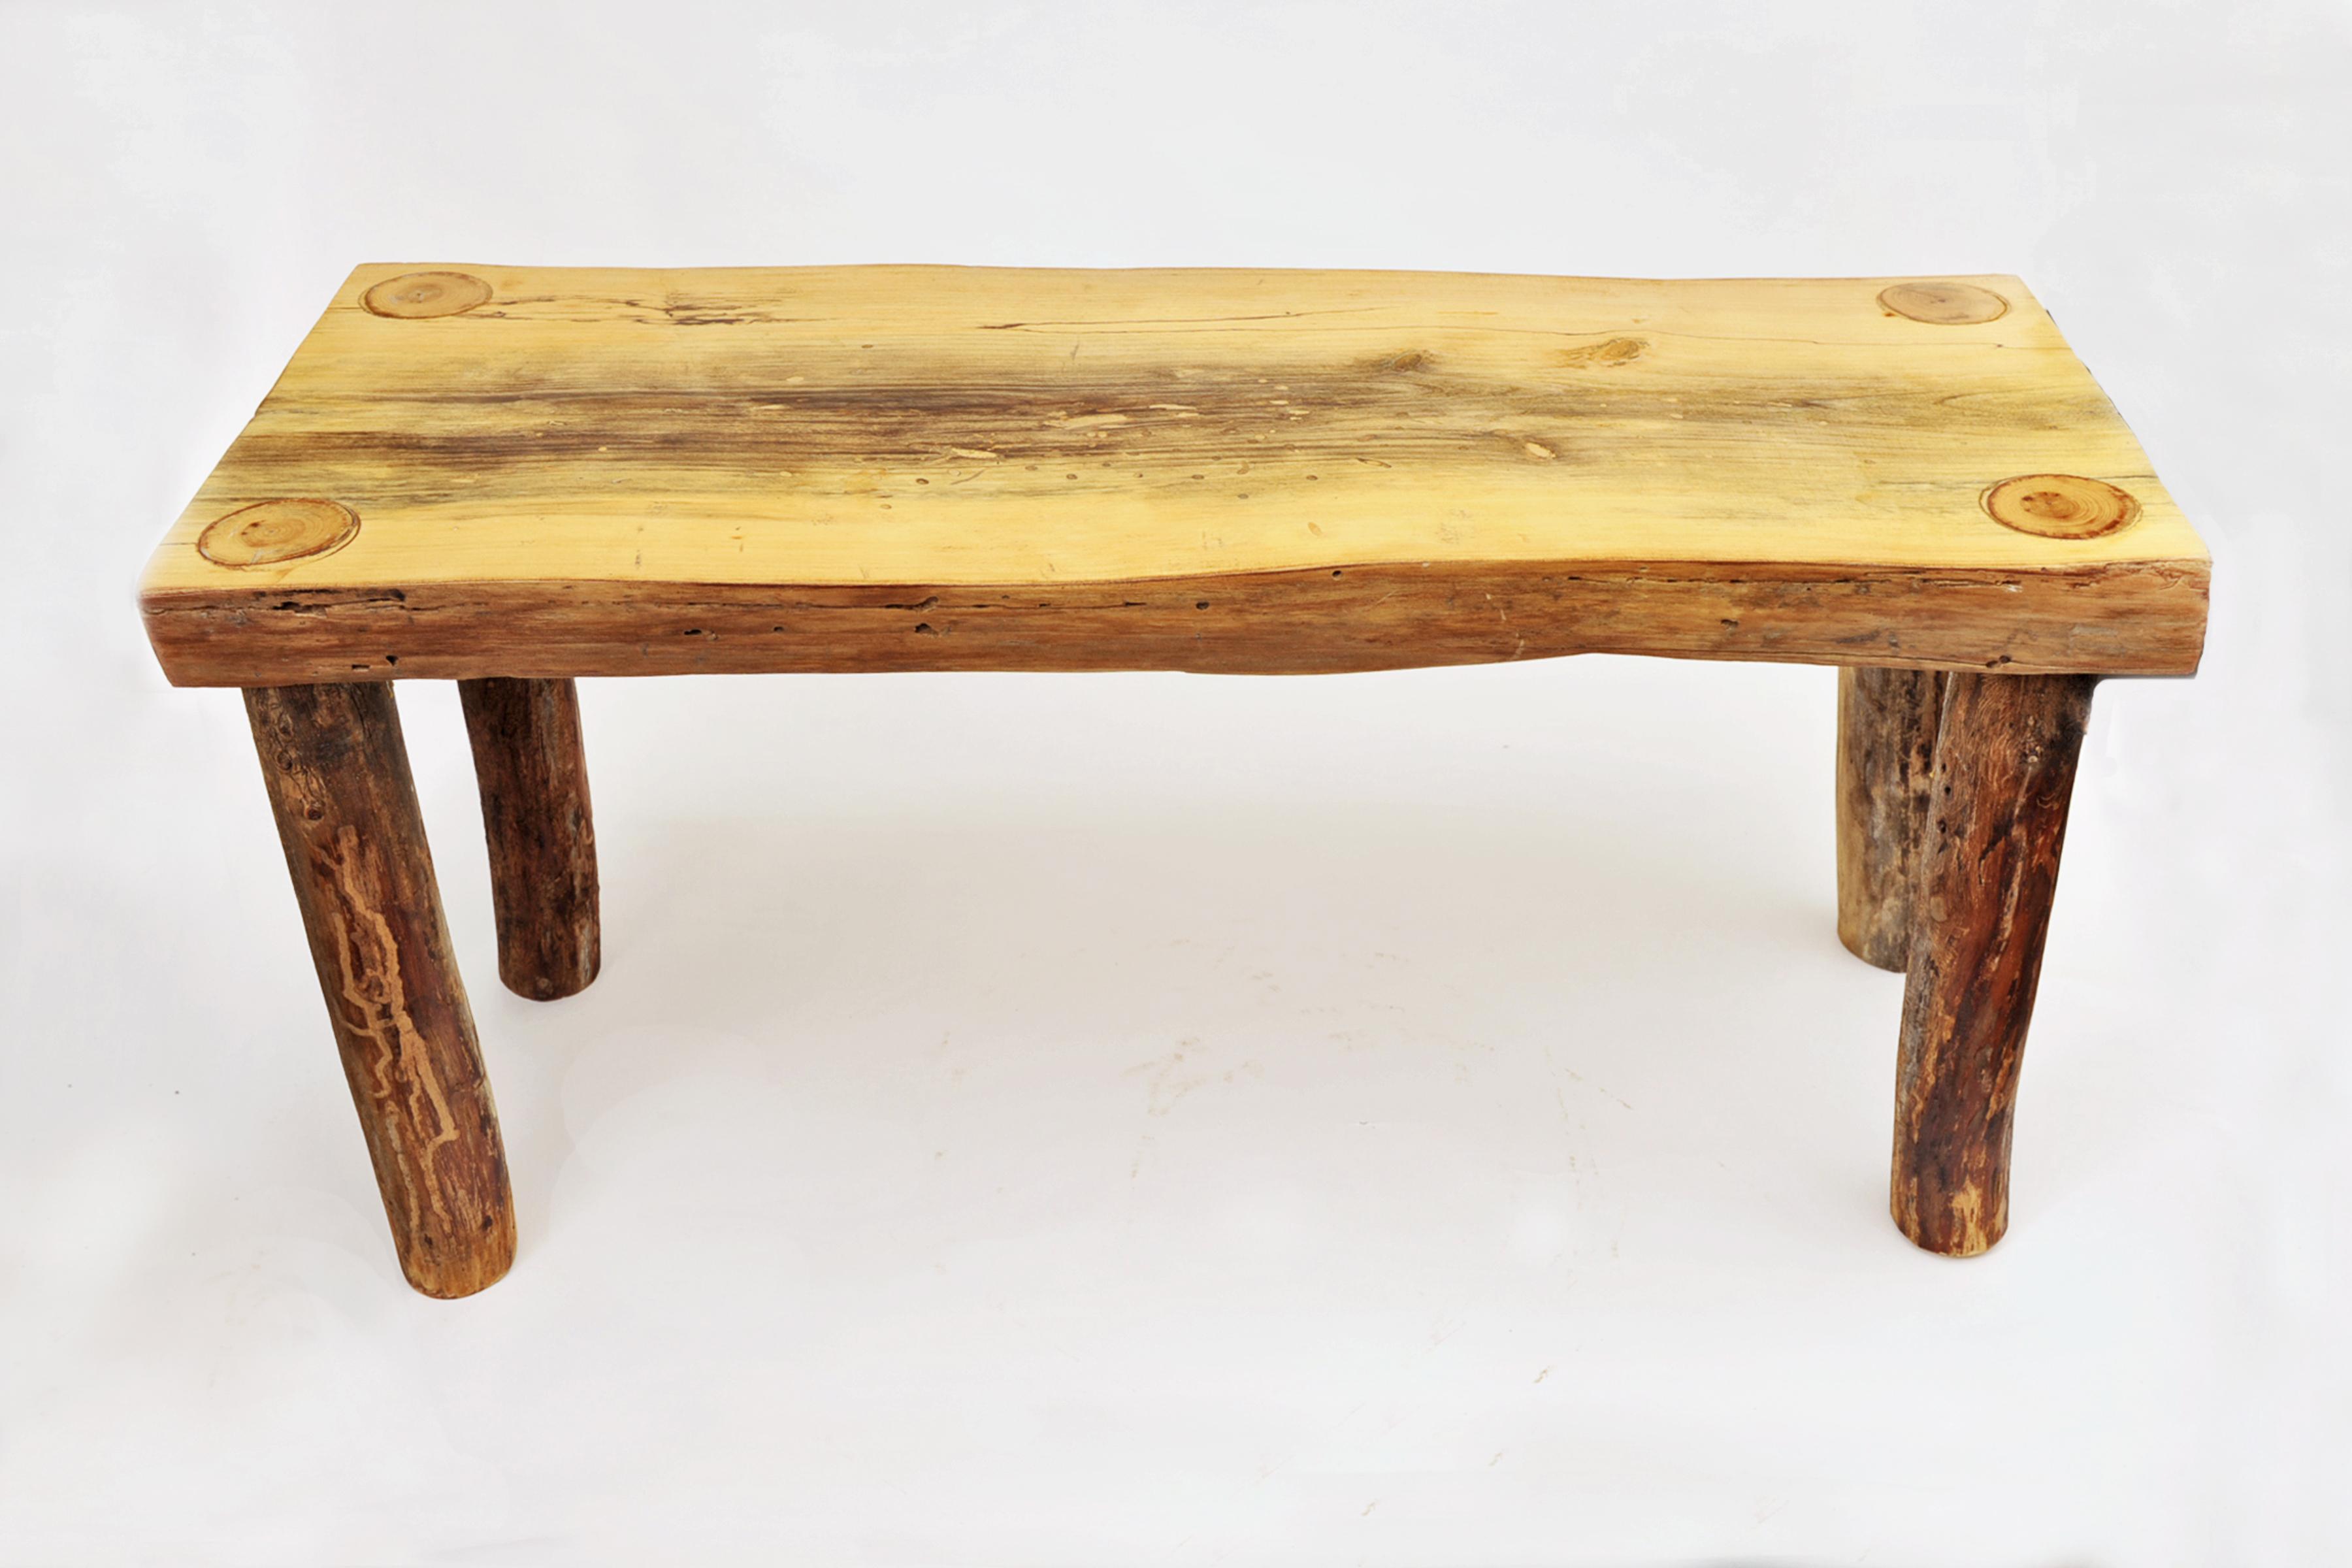 Elm wood bench